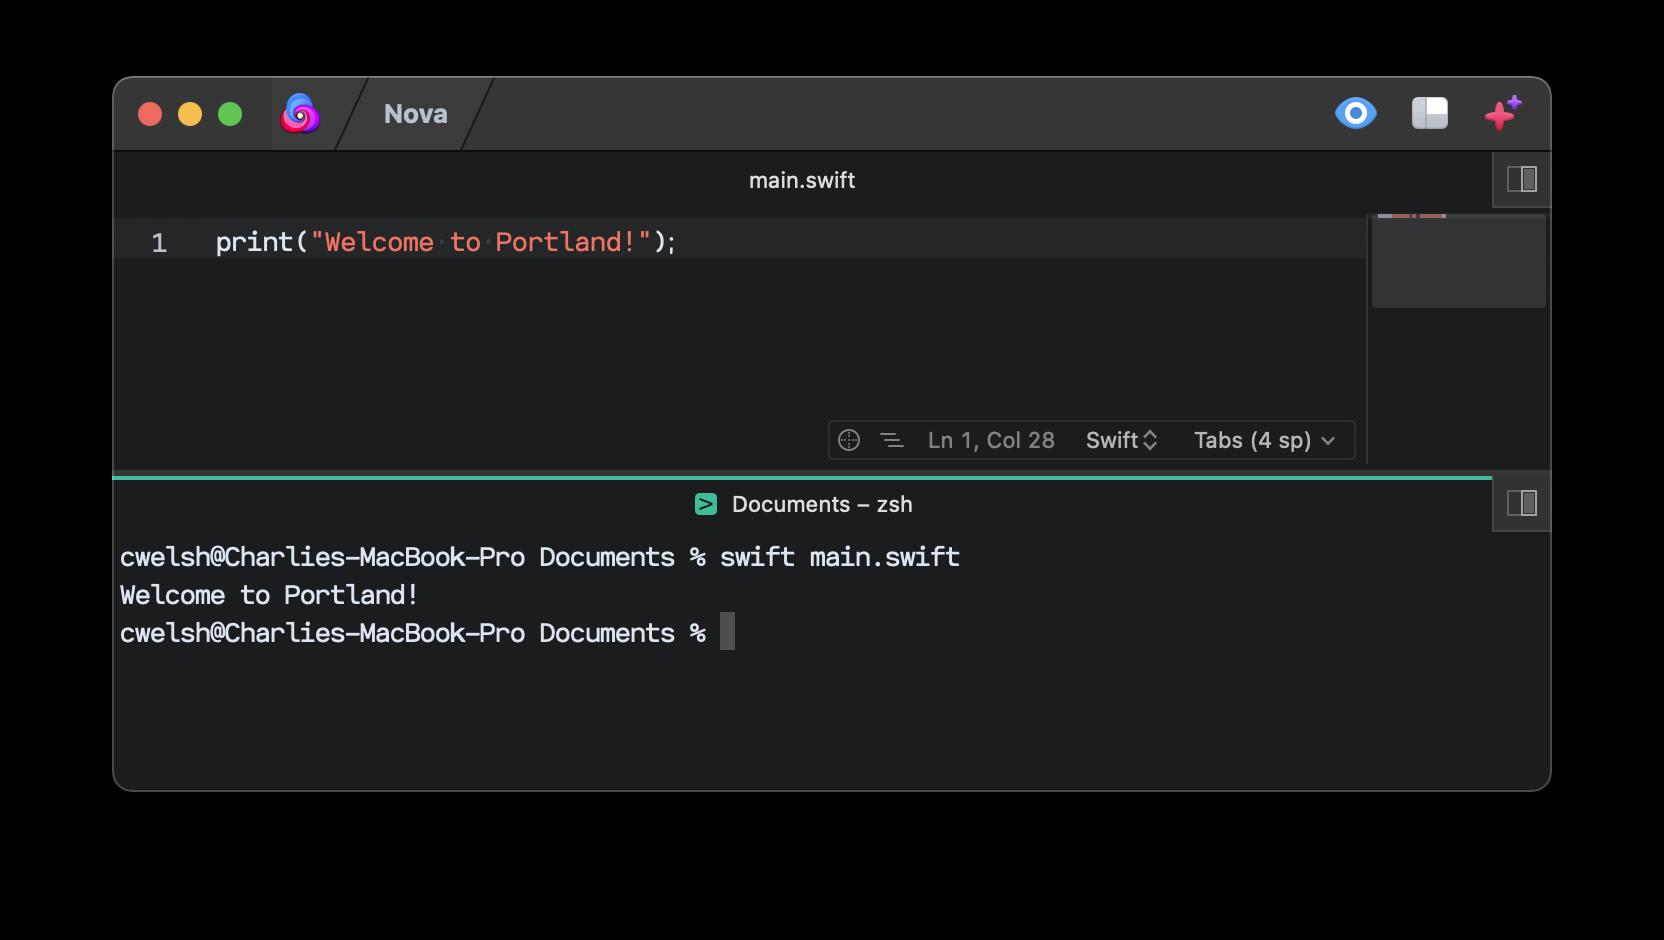 https://cloud-ngjwdhqnc-hack-club-bot.vercel.app/0screen_shot_2021-06-04_at_15.41.56.png